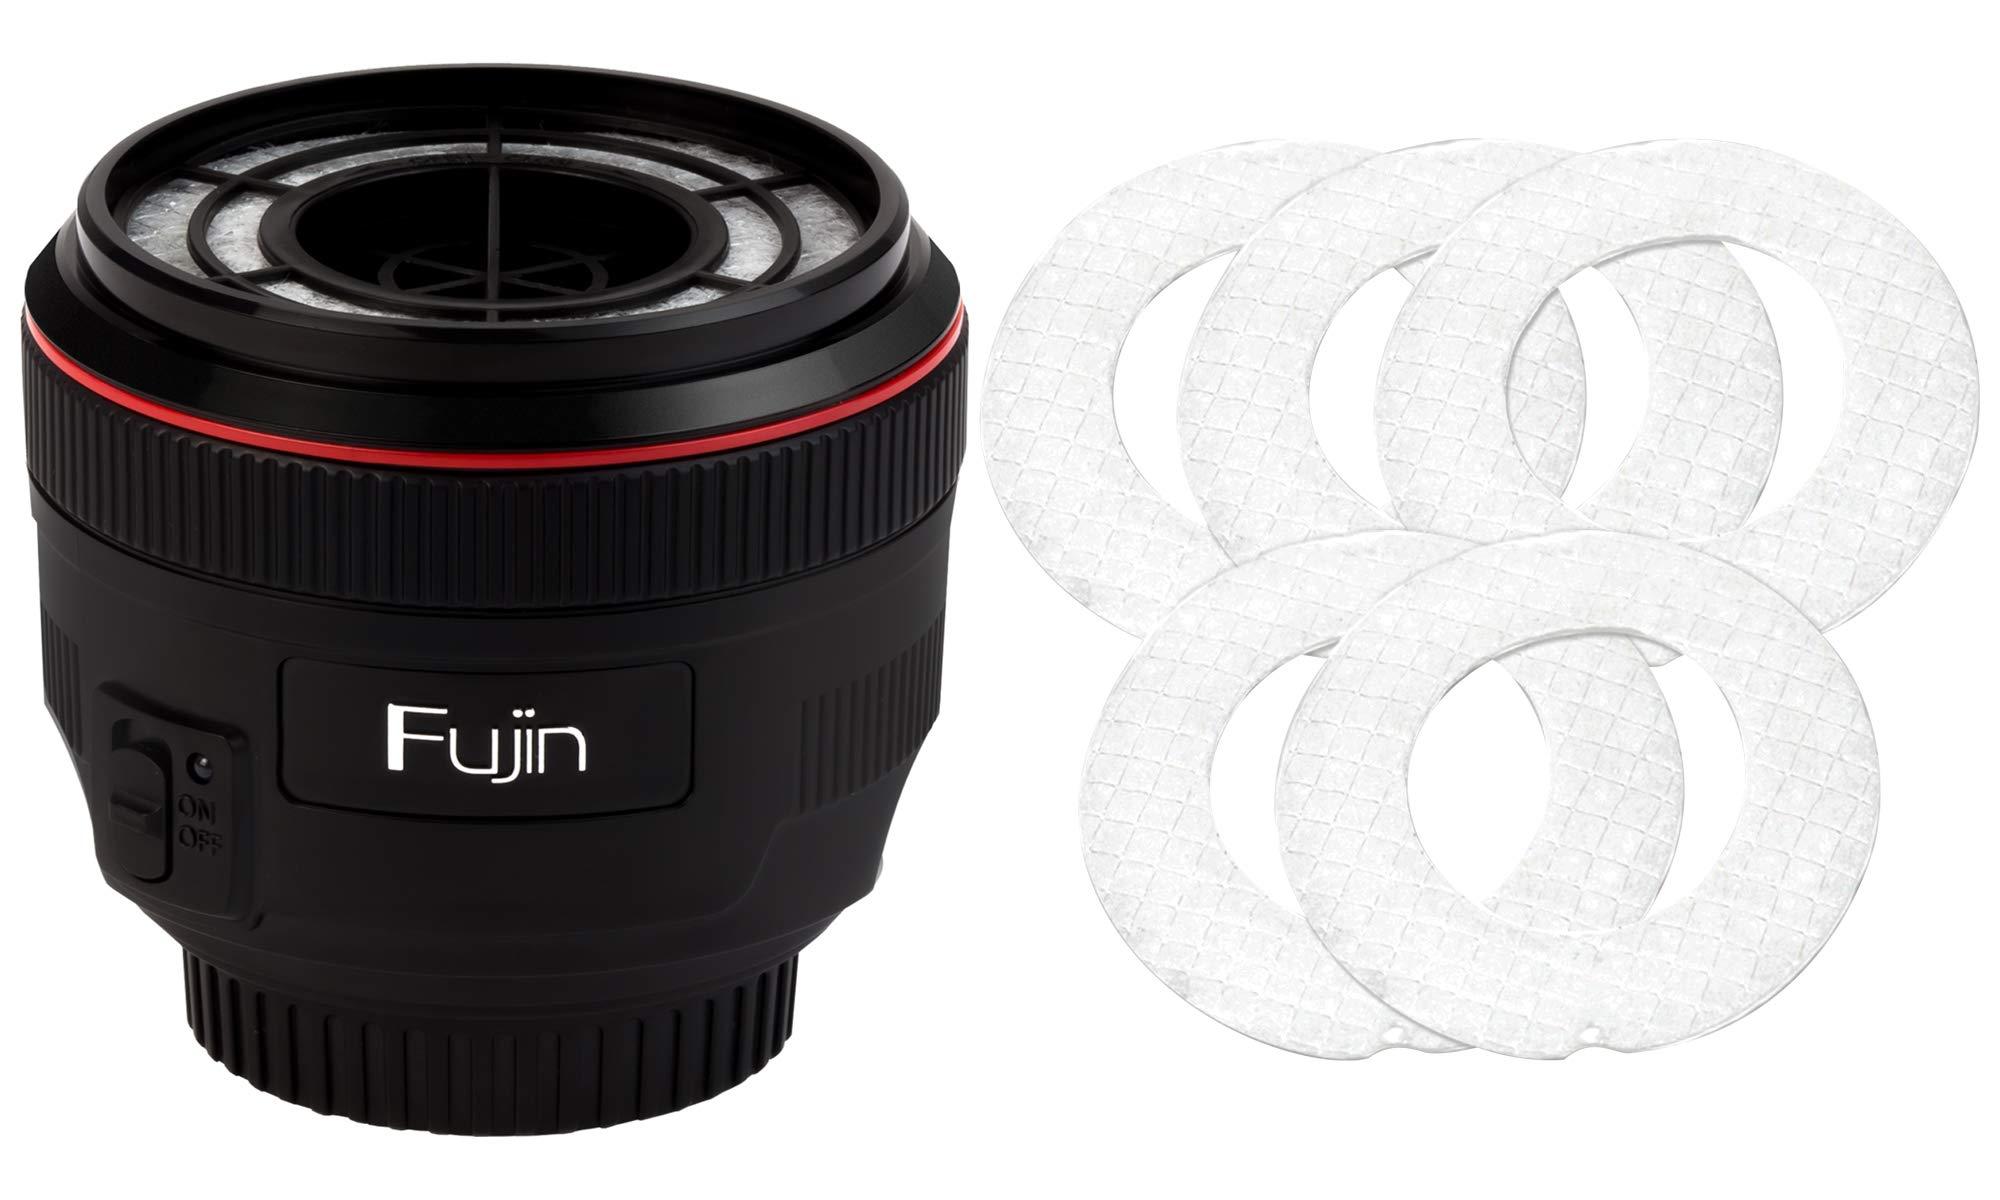 Fujin Mark 2/R/Camera Cleaning kit/Filter Set for Canon EF-Mount Model by Fujin